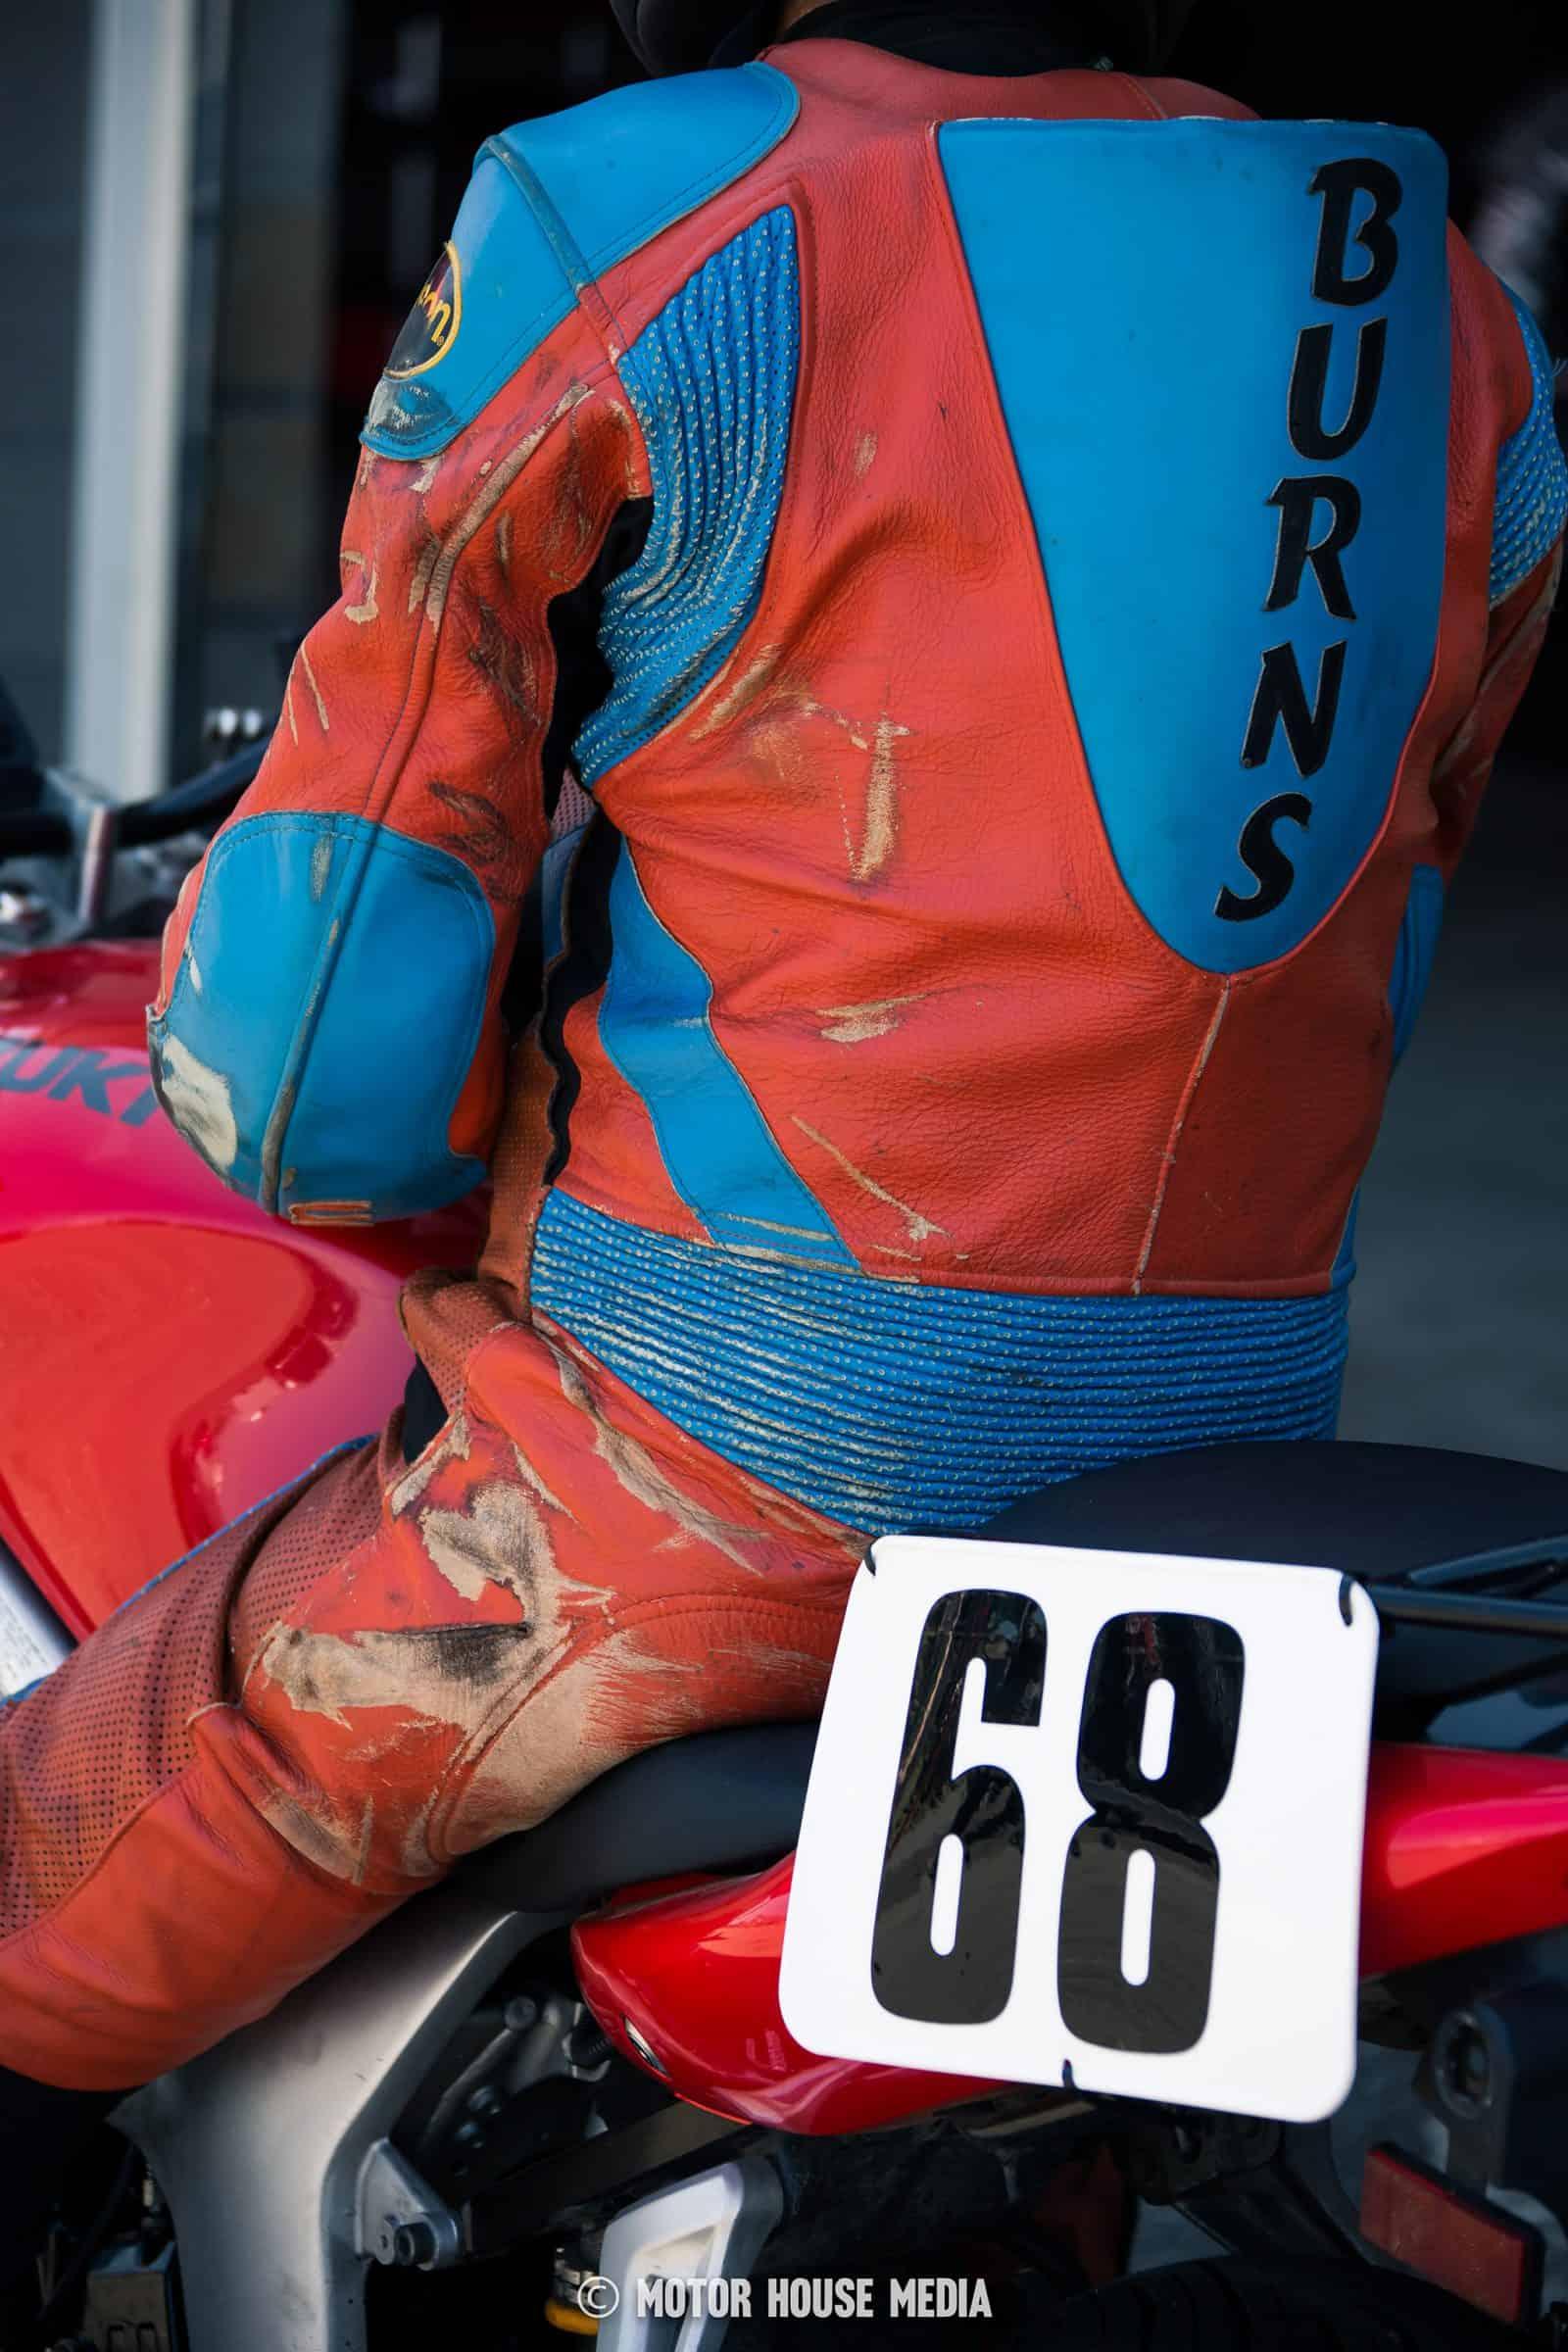 AHMRA vintage racer road rash suit